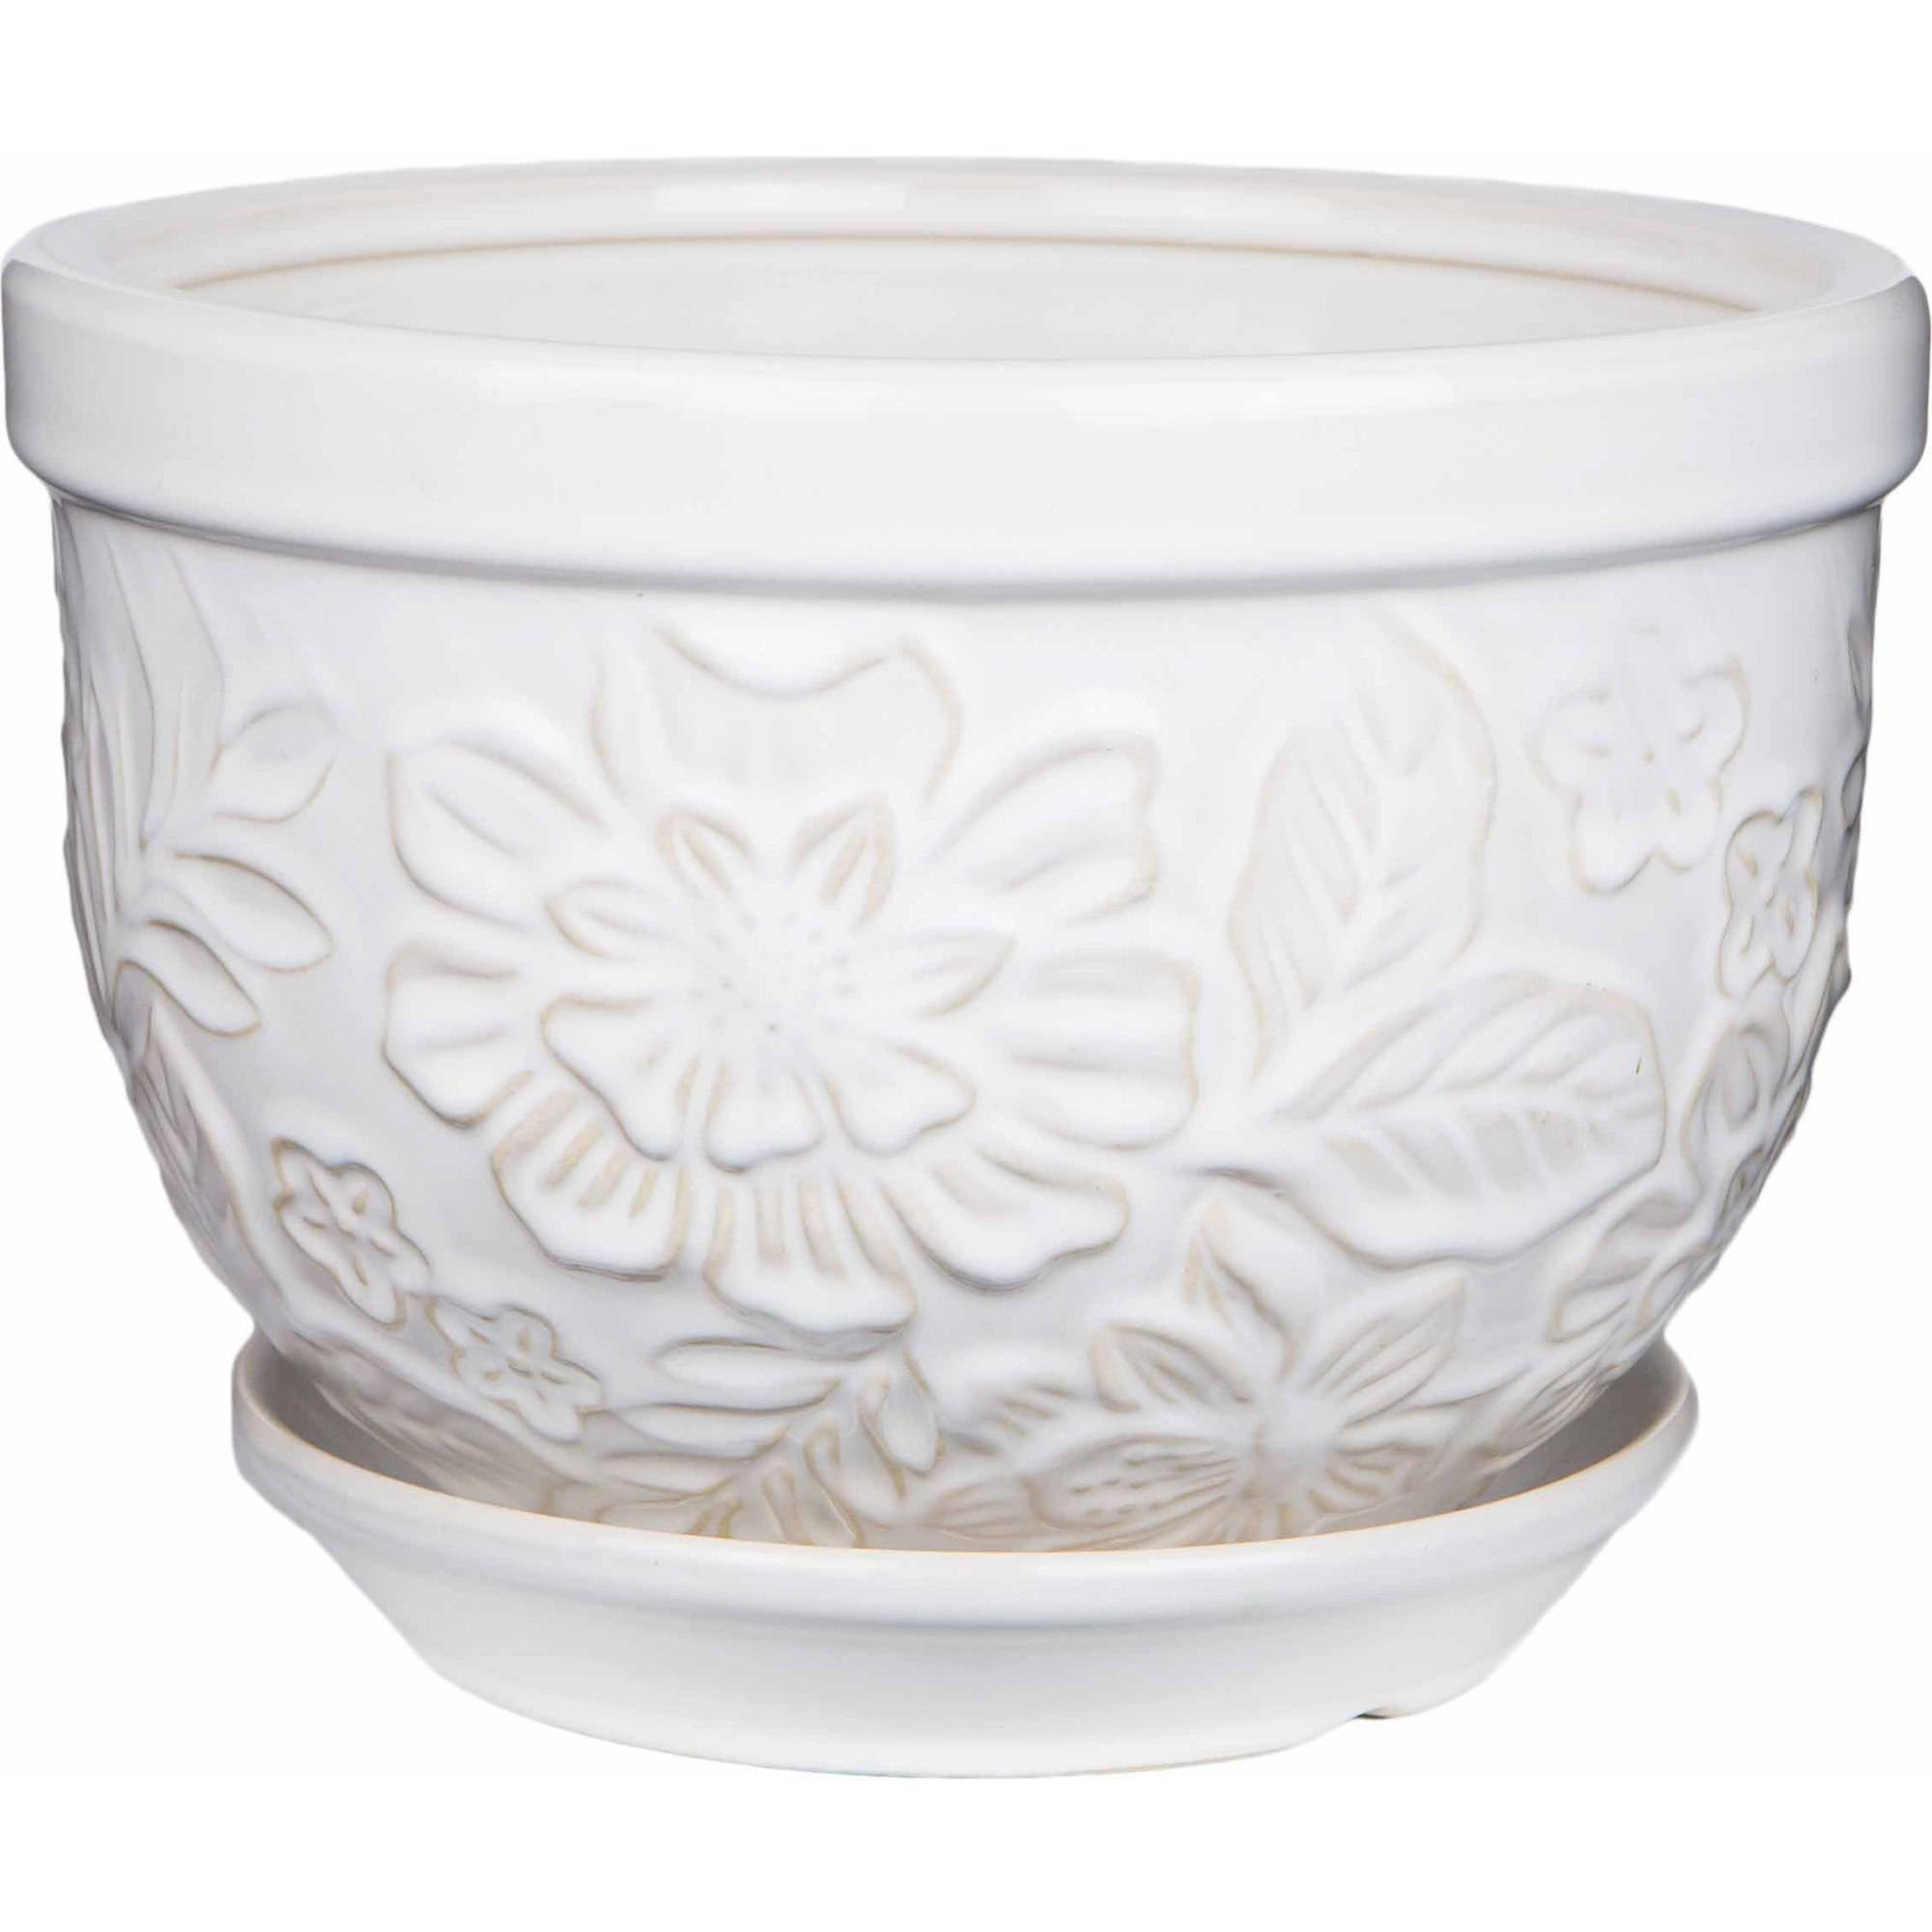 Image of Pennington Ceramic Vintage Floral Pot/Planter, 12 inch